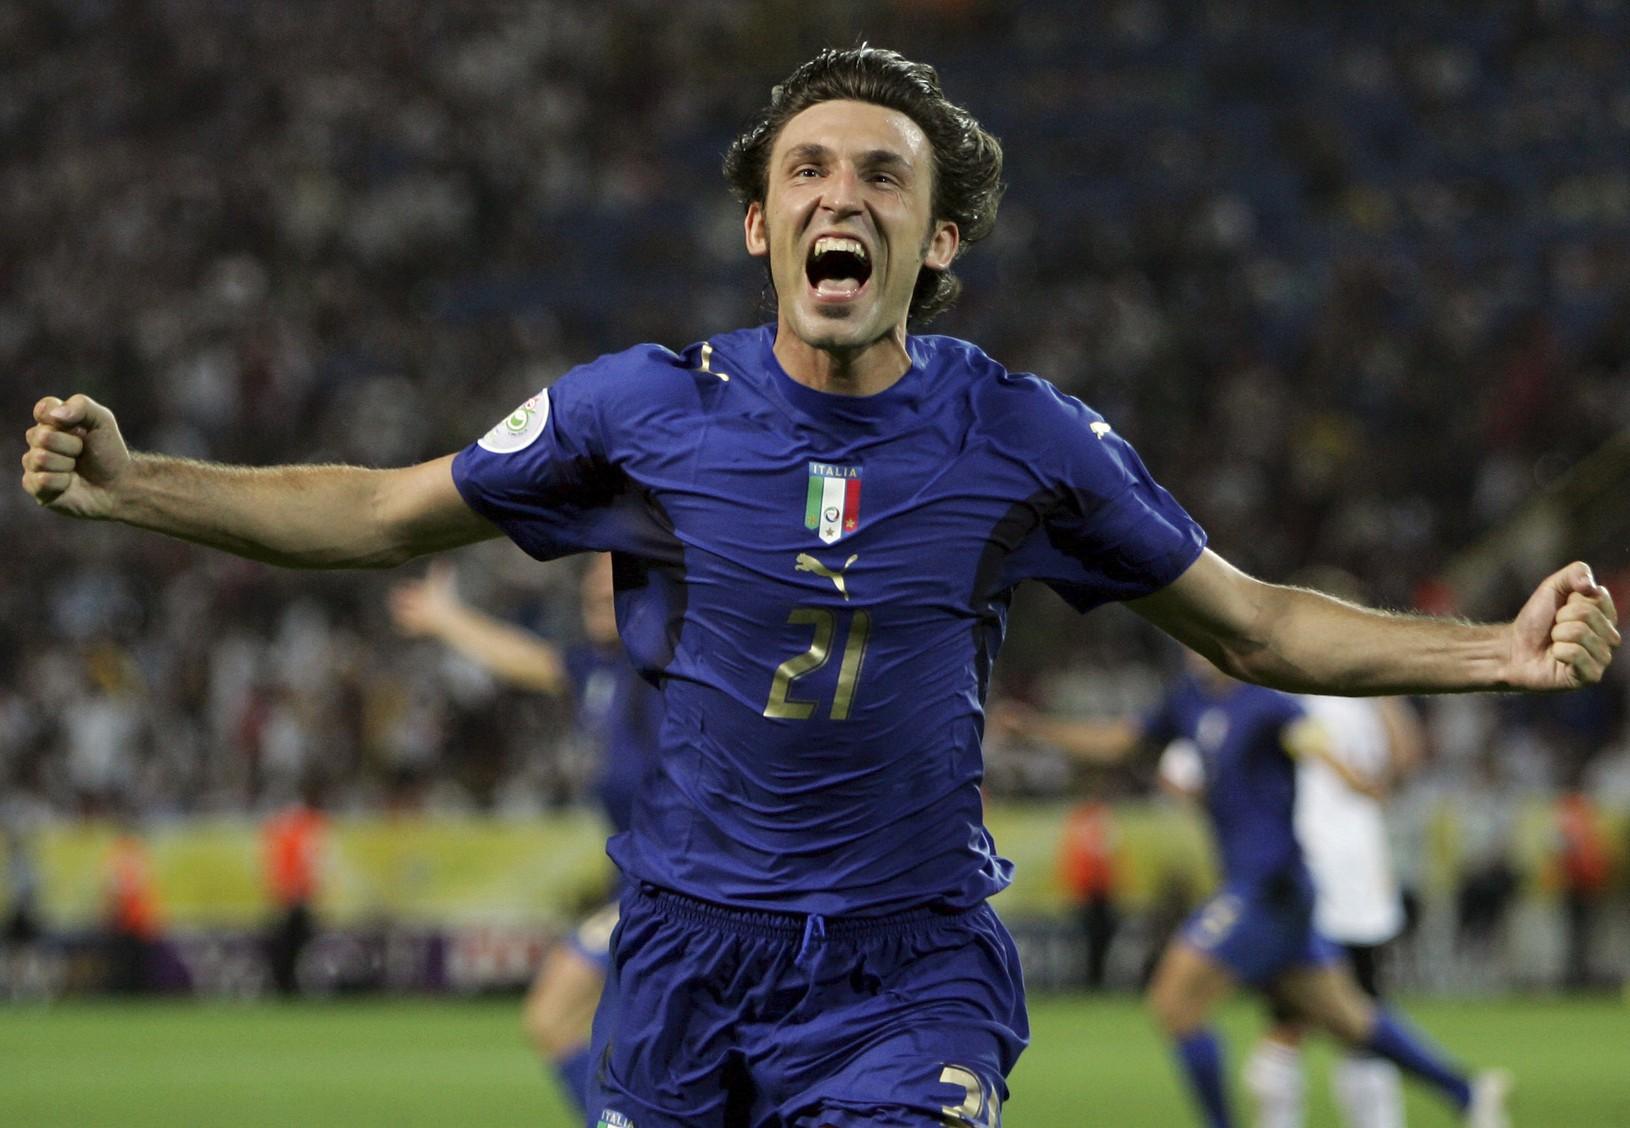 Tréner Juventusu Turín Andrea